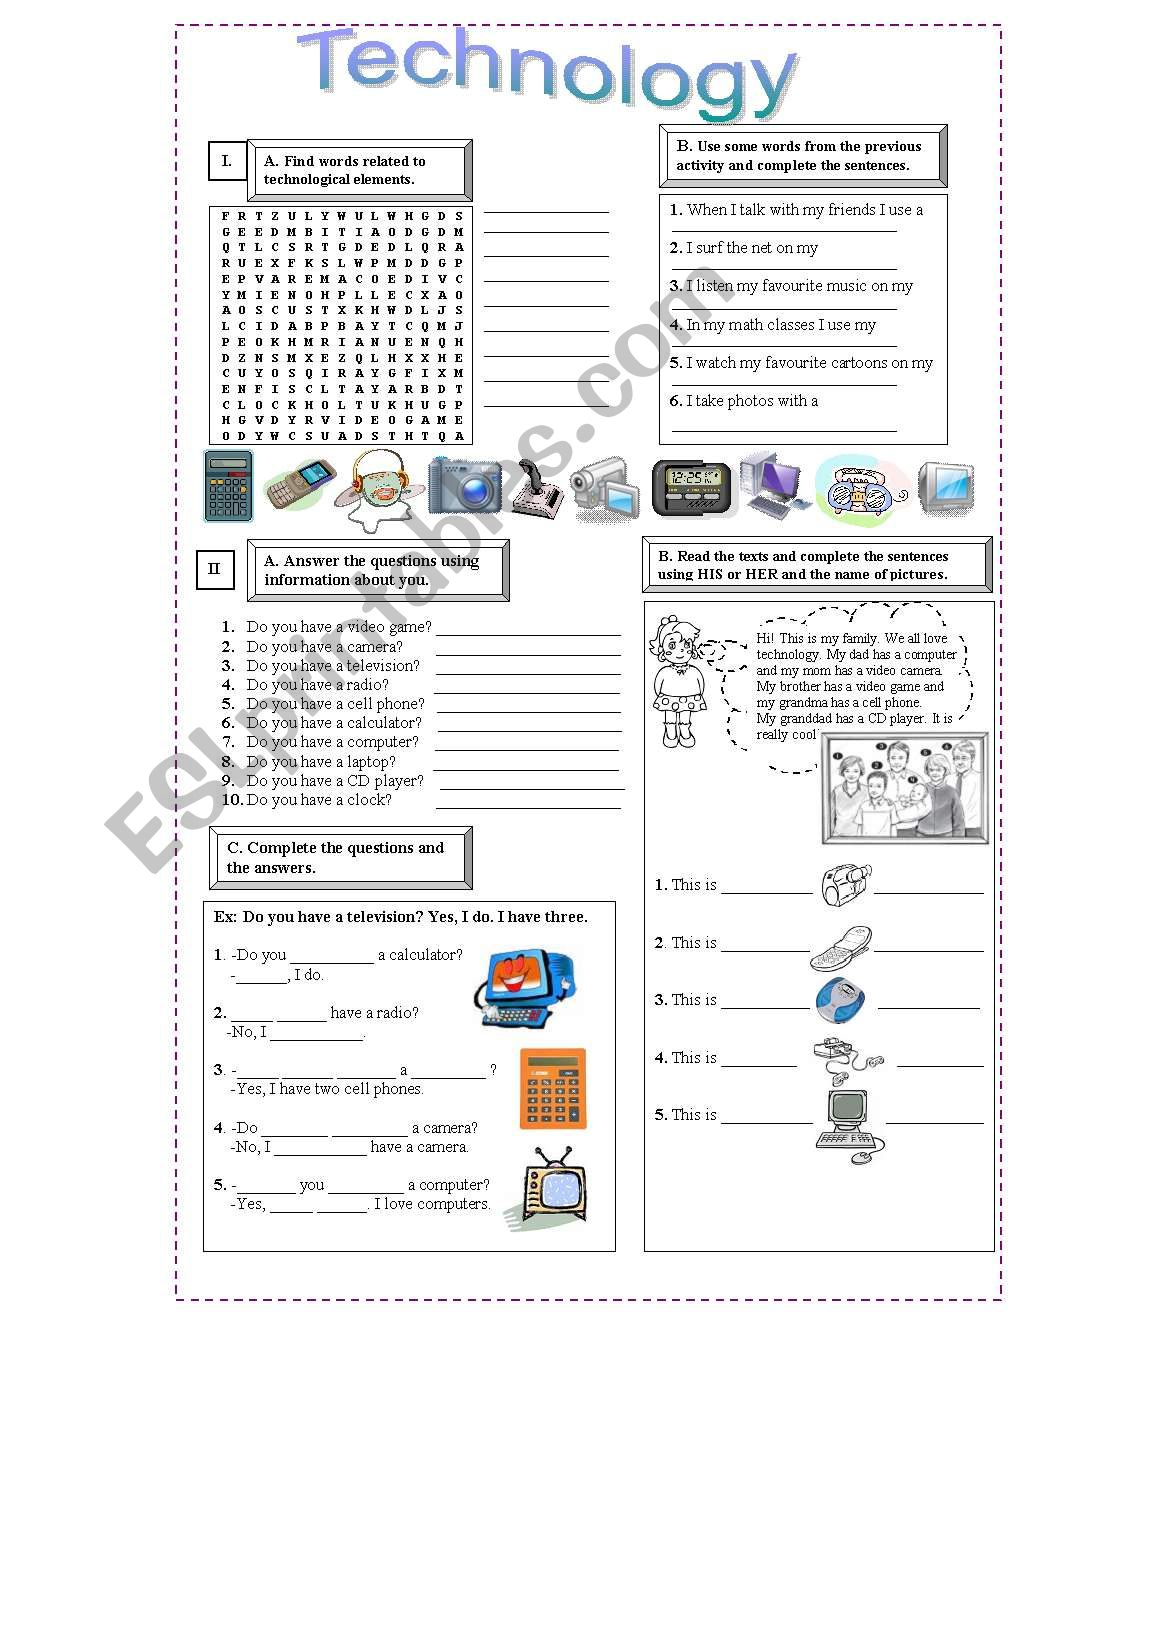 Technology Worksheet Elementary